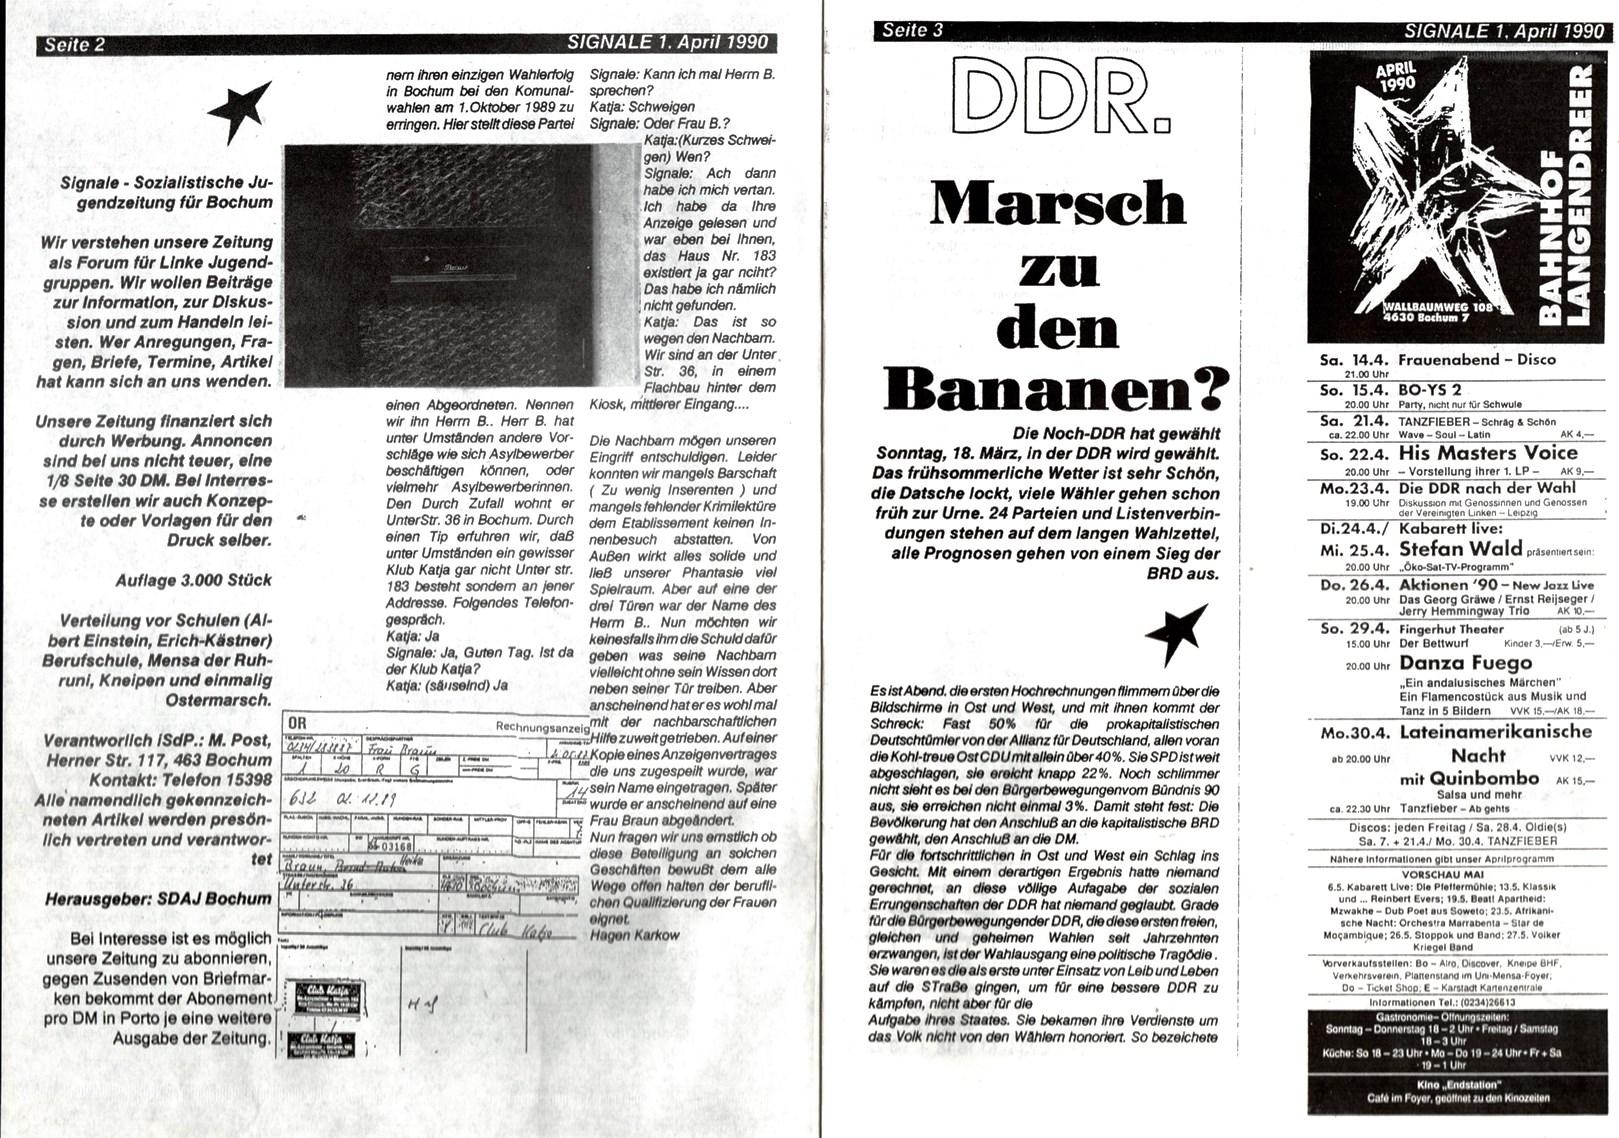 Bochum_SDAJ_Signale_19900400_002